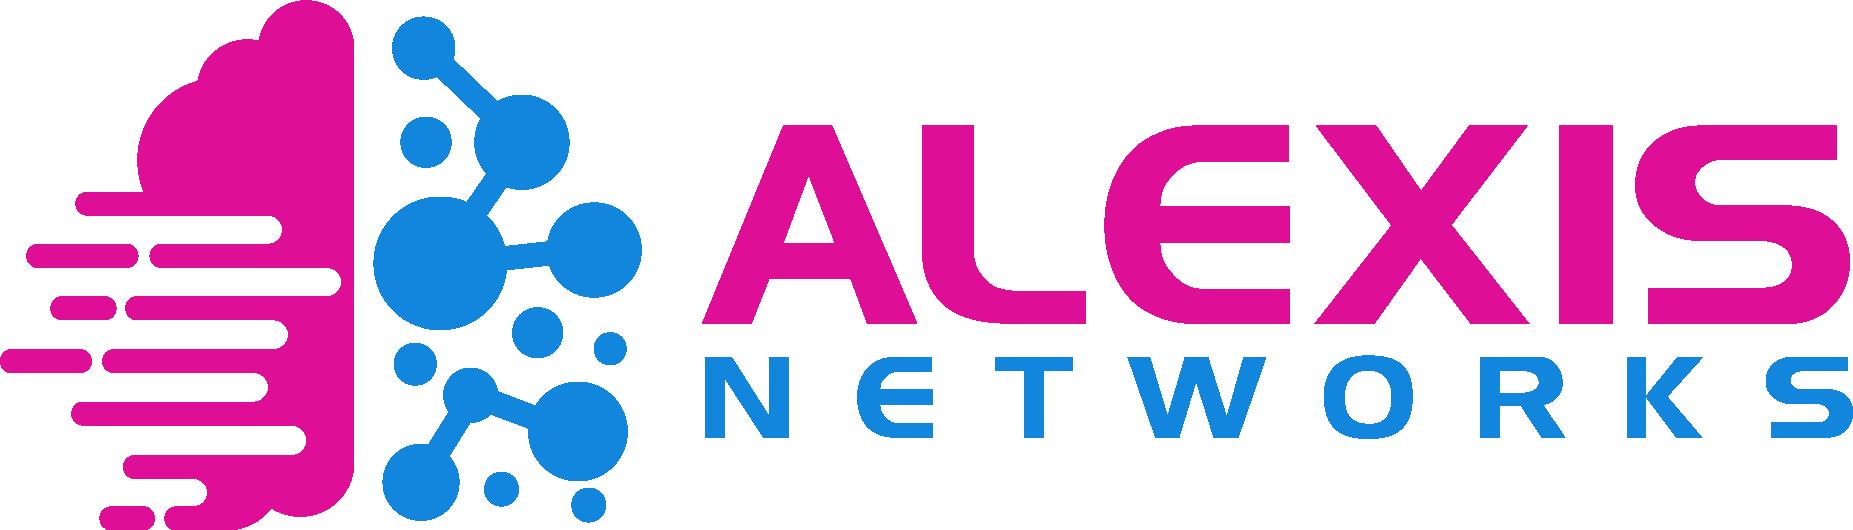 AlexisNetworks_Final-Mar-01-2021-10-28-54-03-PM